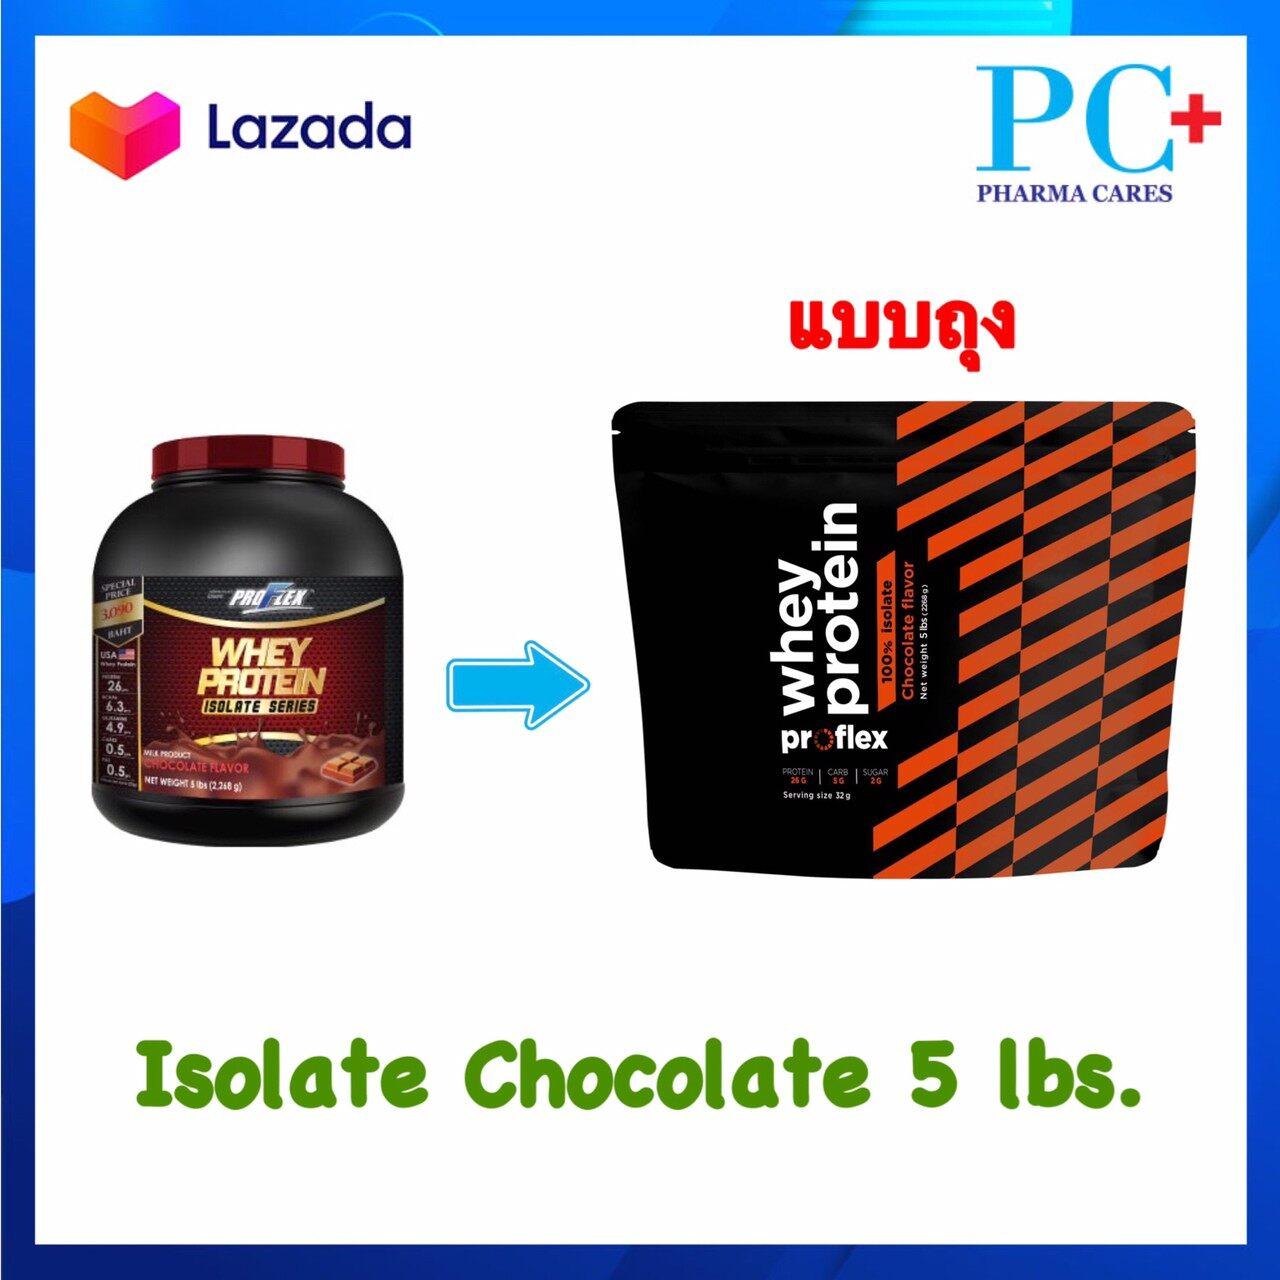 EXP 010322 Proflex Whey Protein Isolate Chocolate 5 lbs เวย์โปรตีน ไอโซเลท รสช็อคโกแลต ขนาด 5 ปอนด์ แบบถุง